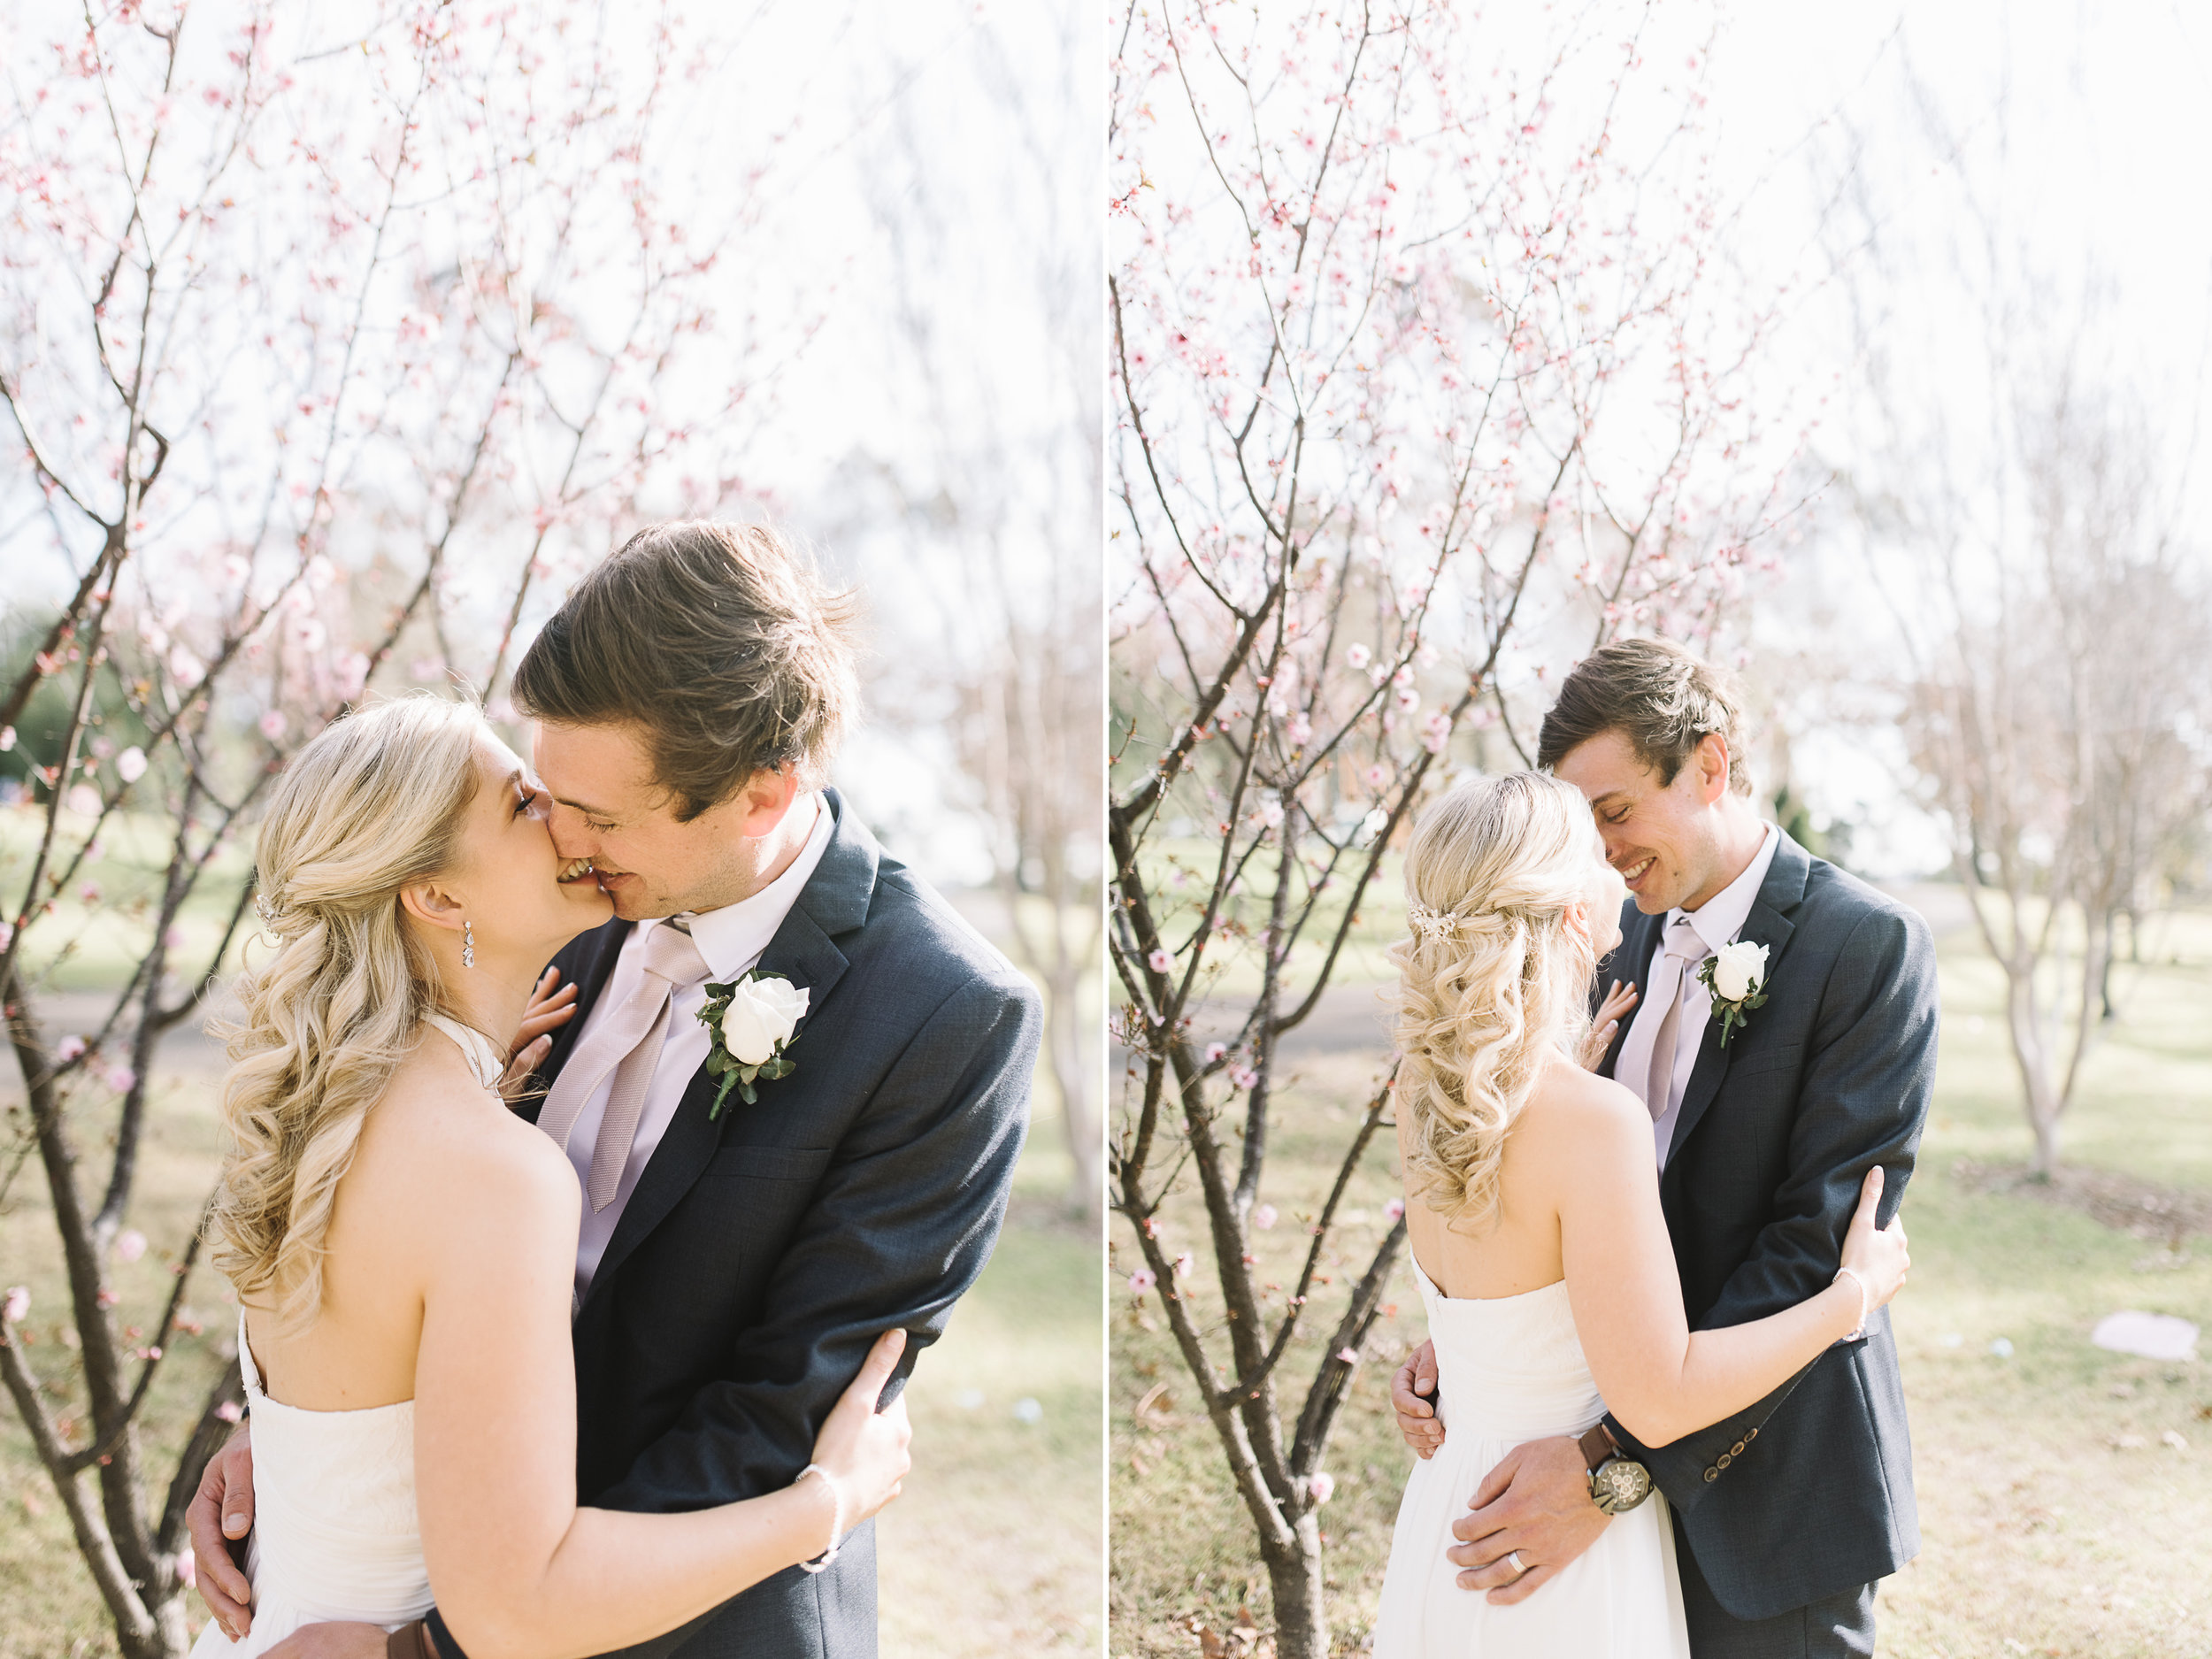 sydney-wedding-photographer-8.jpg